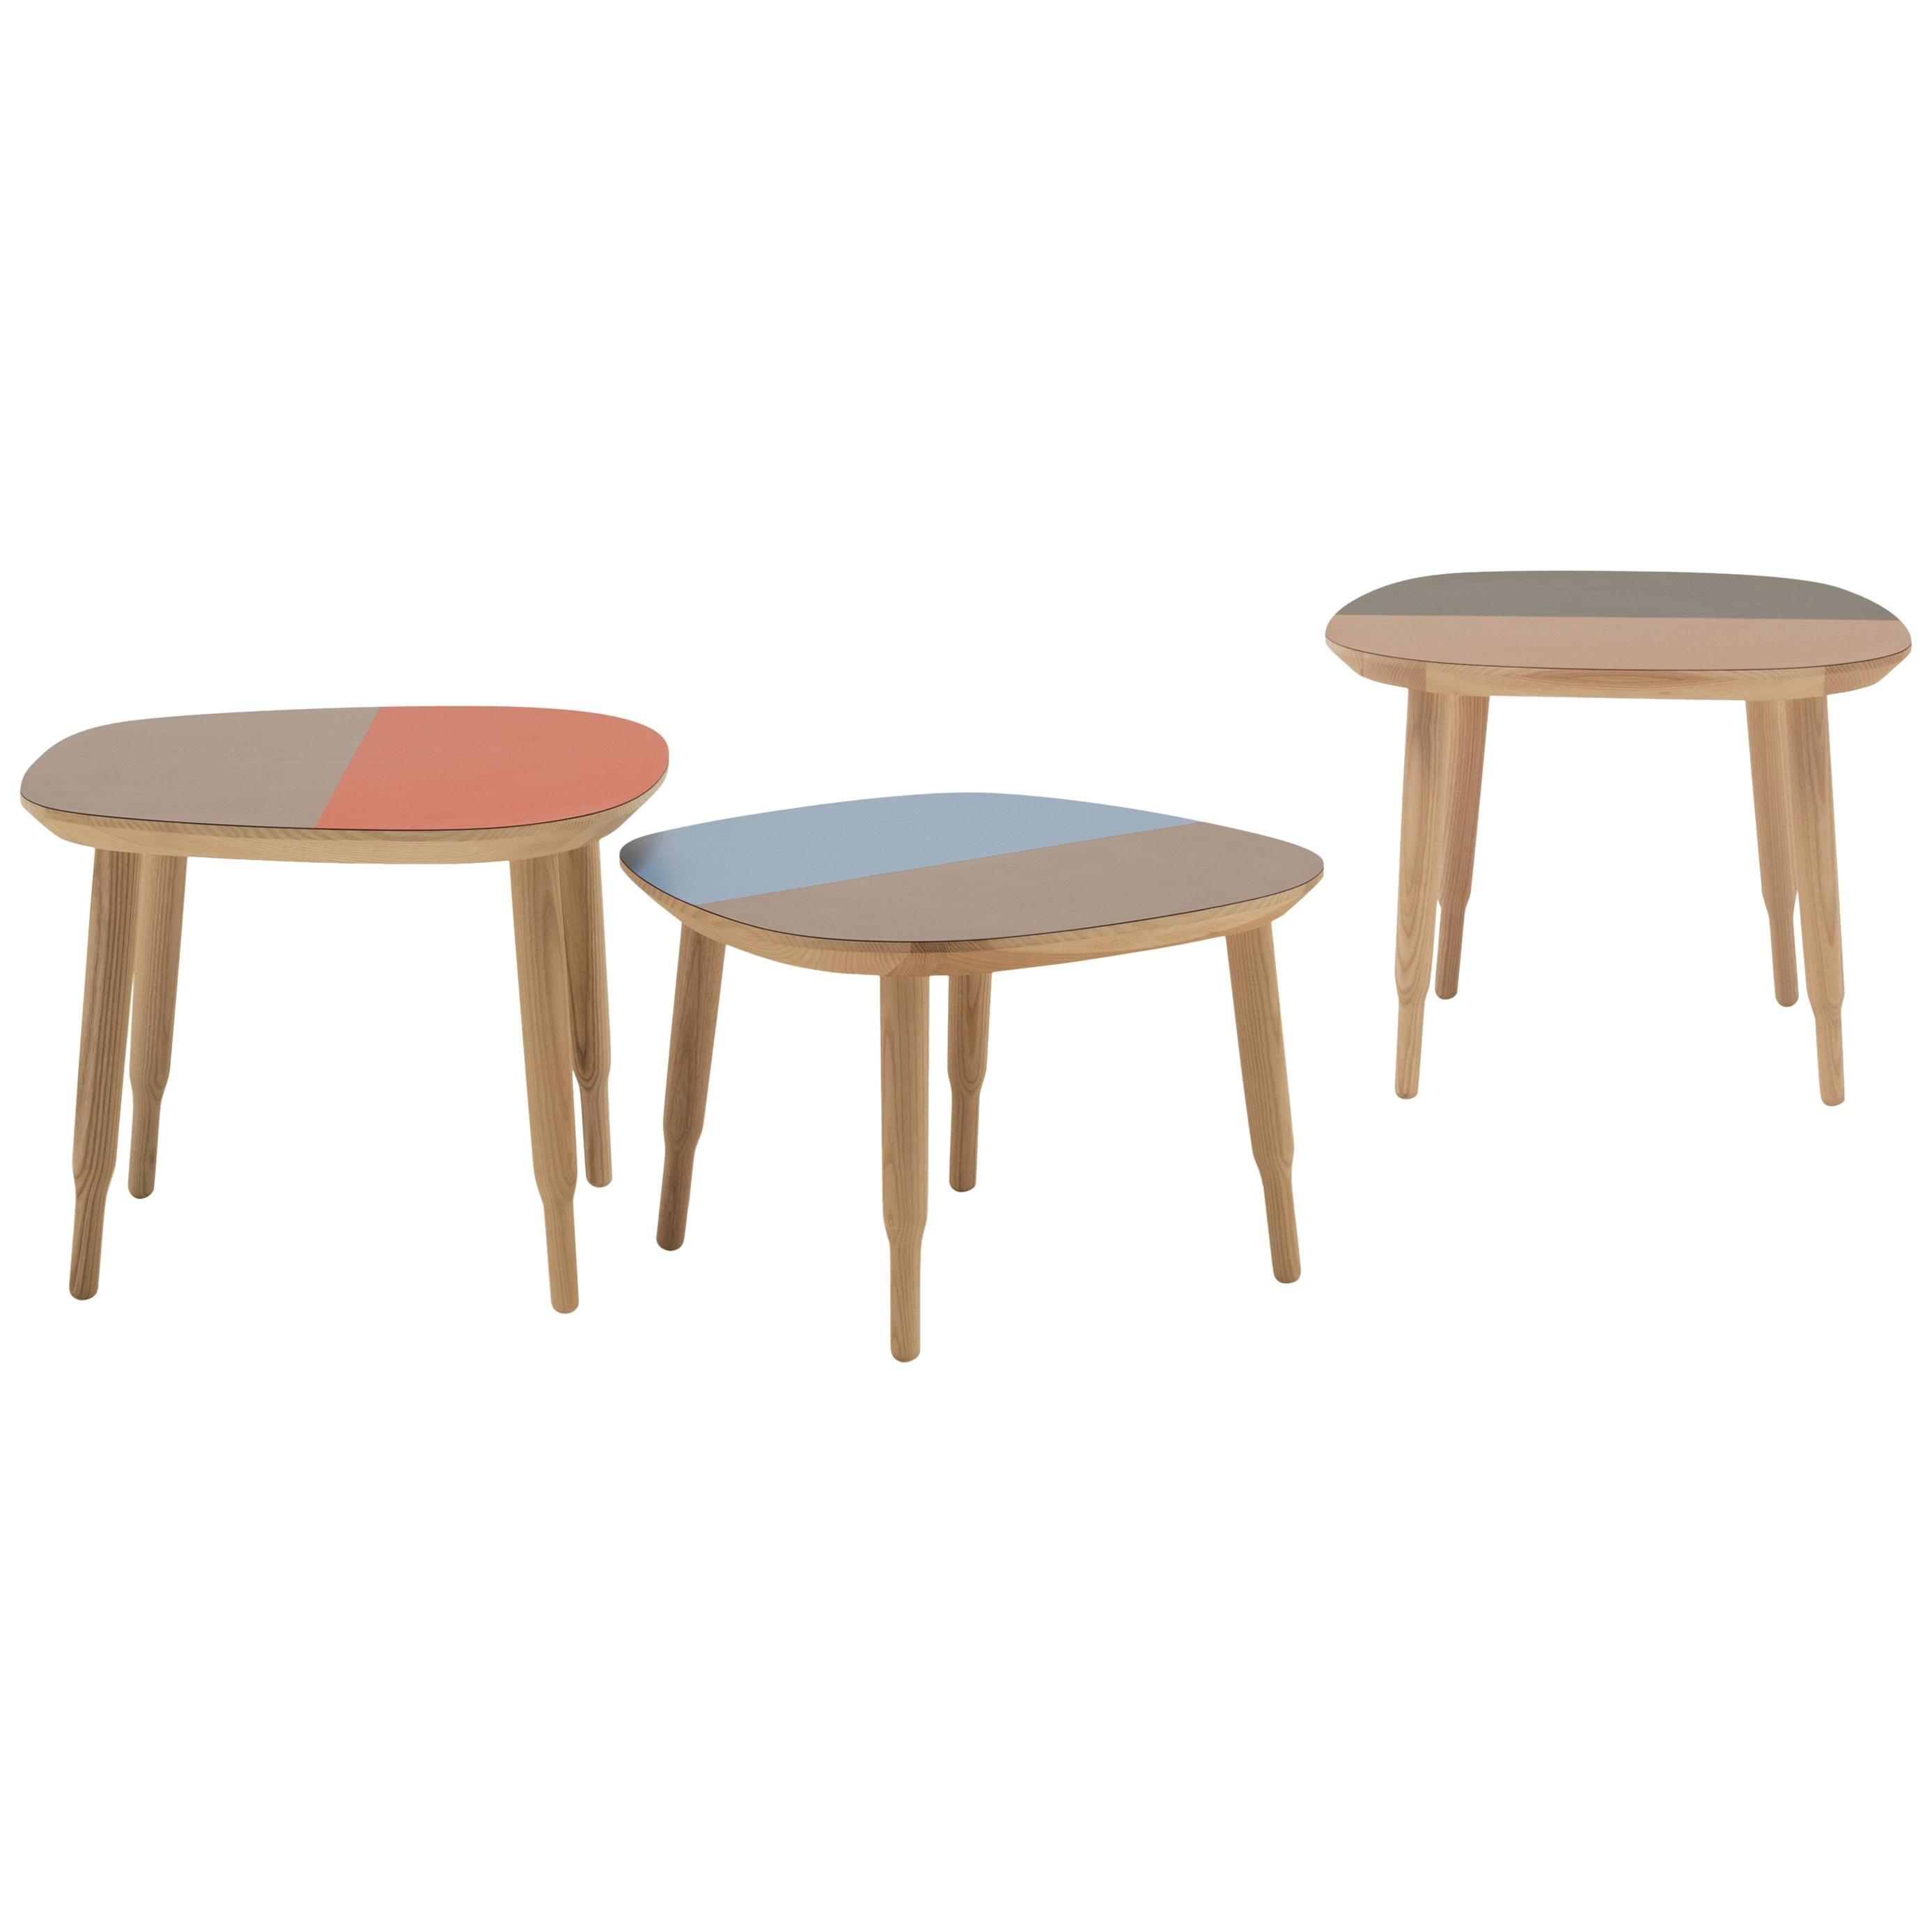 Bump -  colourful ashwood occasional table, designed by Nigel Coates